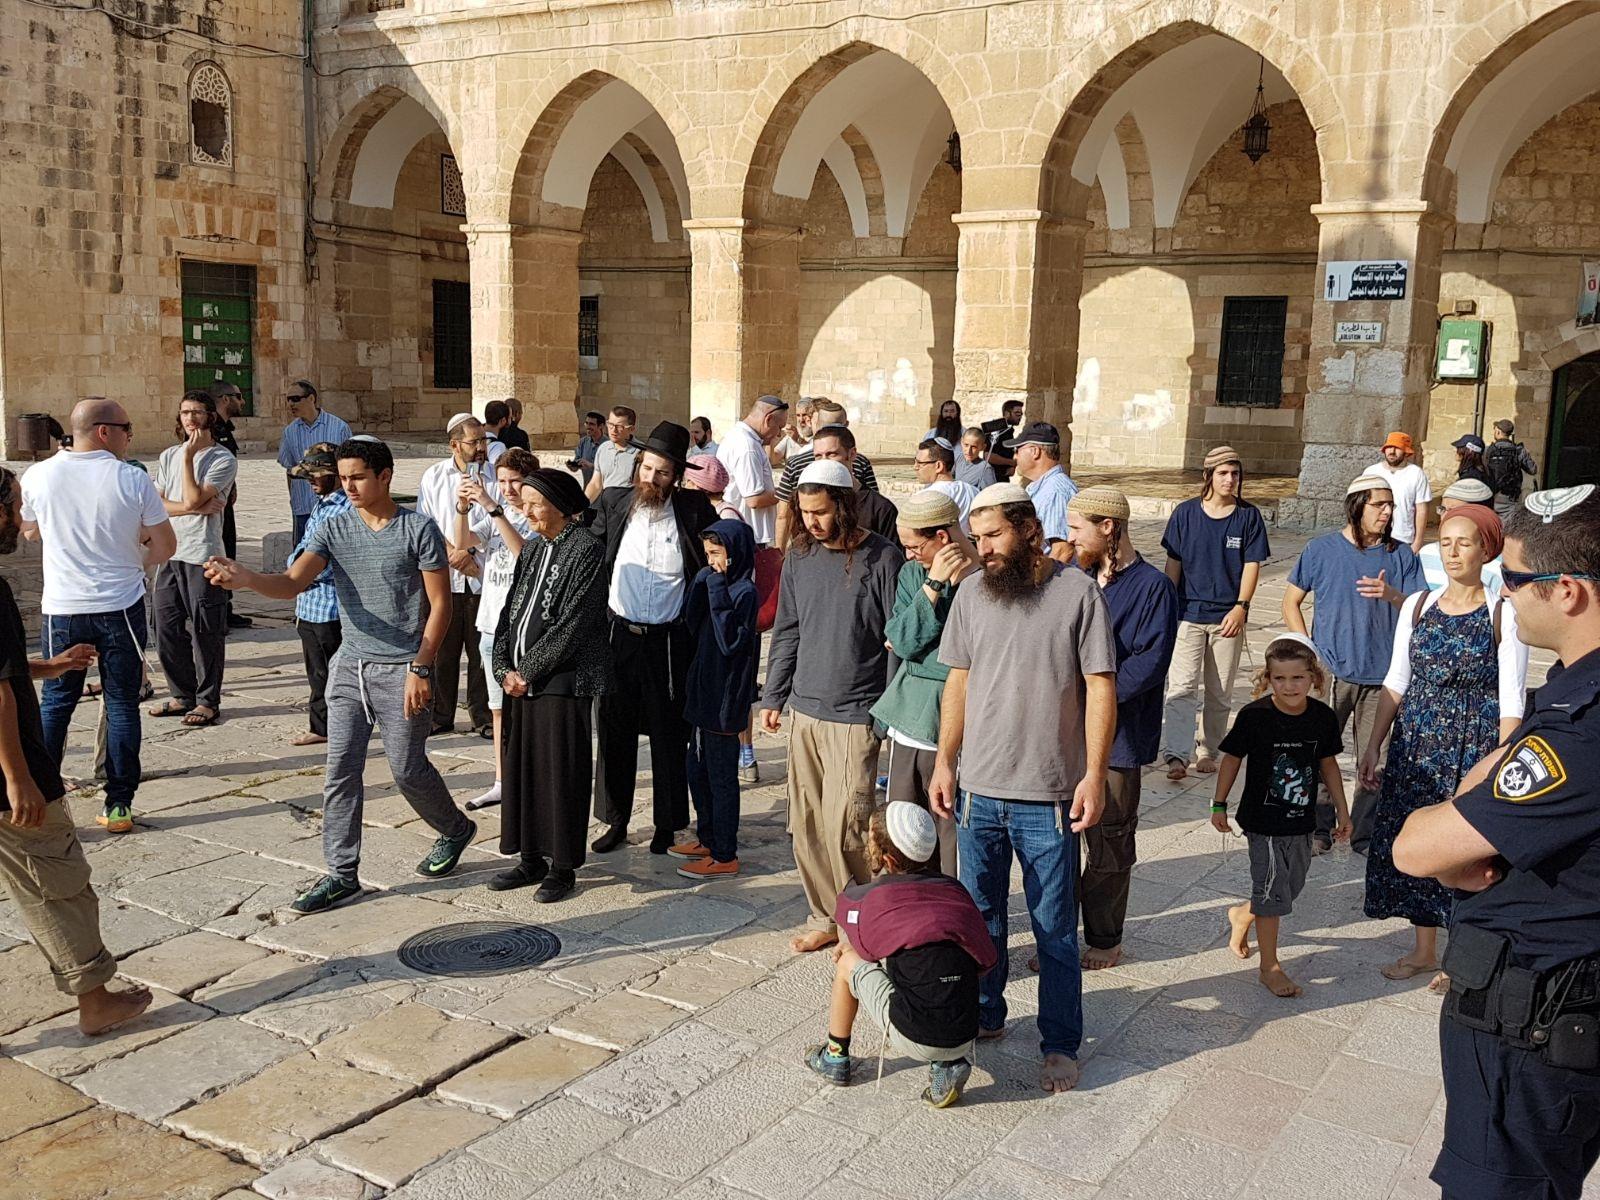 Gerusalemme, 131 coloni israeliani fanno irruzione a al-Aqsa